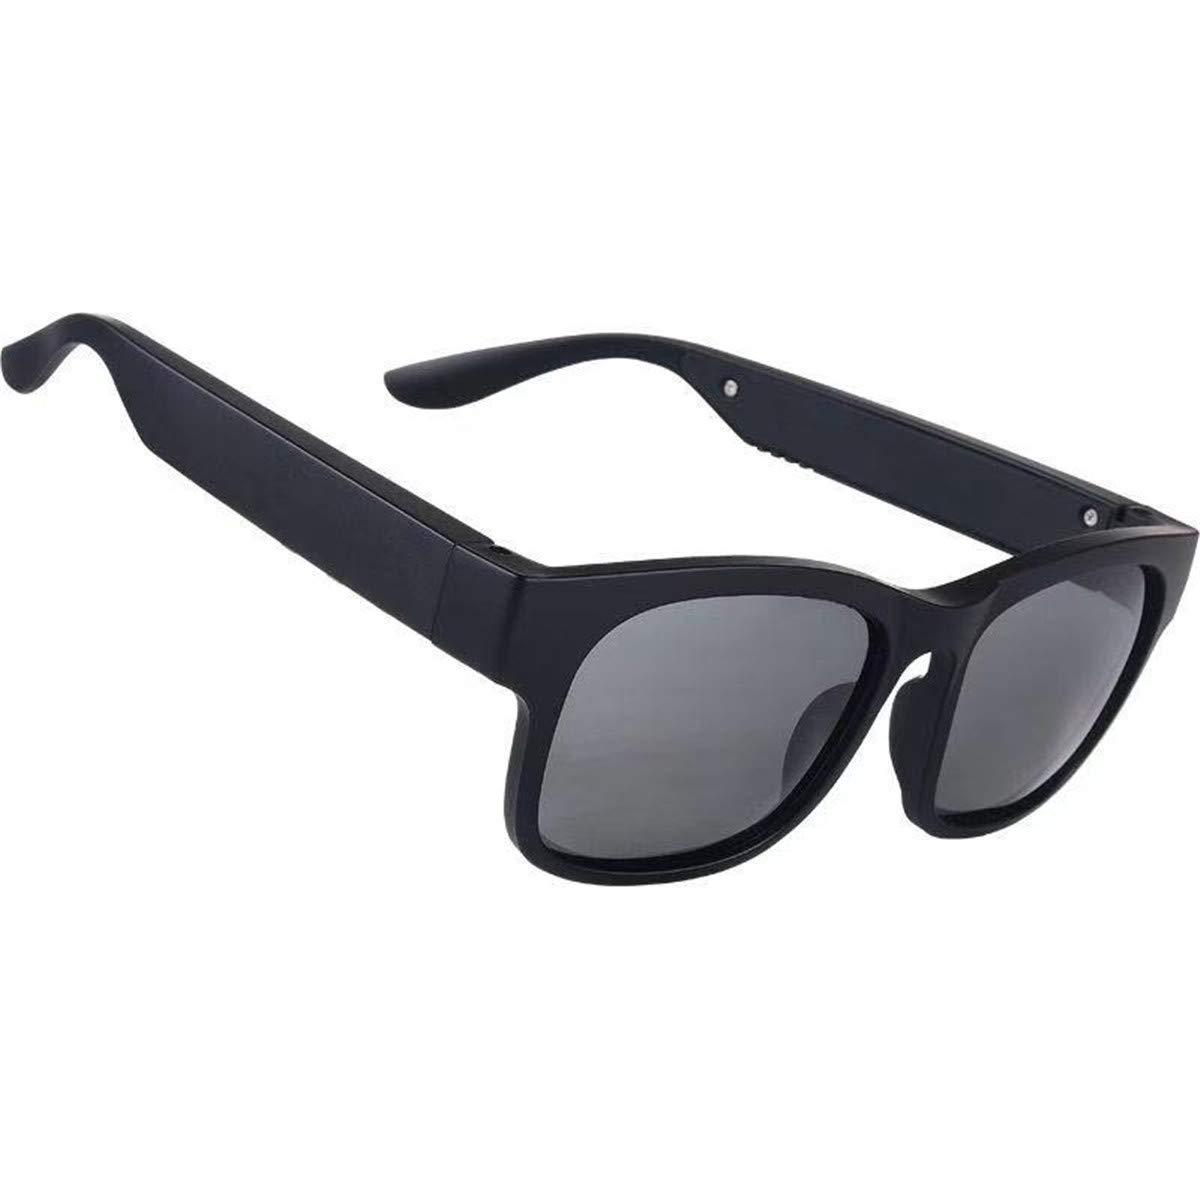 AOHOG Smart Bluetooth 5.0 Stereo Headset Outdoor Sunglasses Waterproof IP7 Wireless Music Glasses